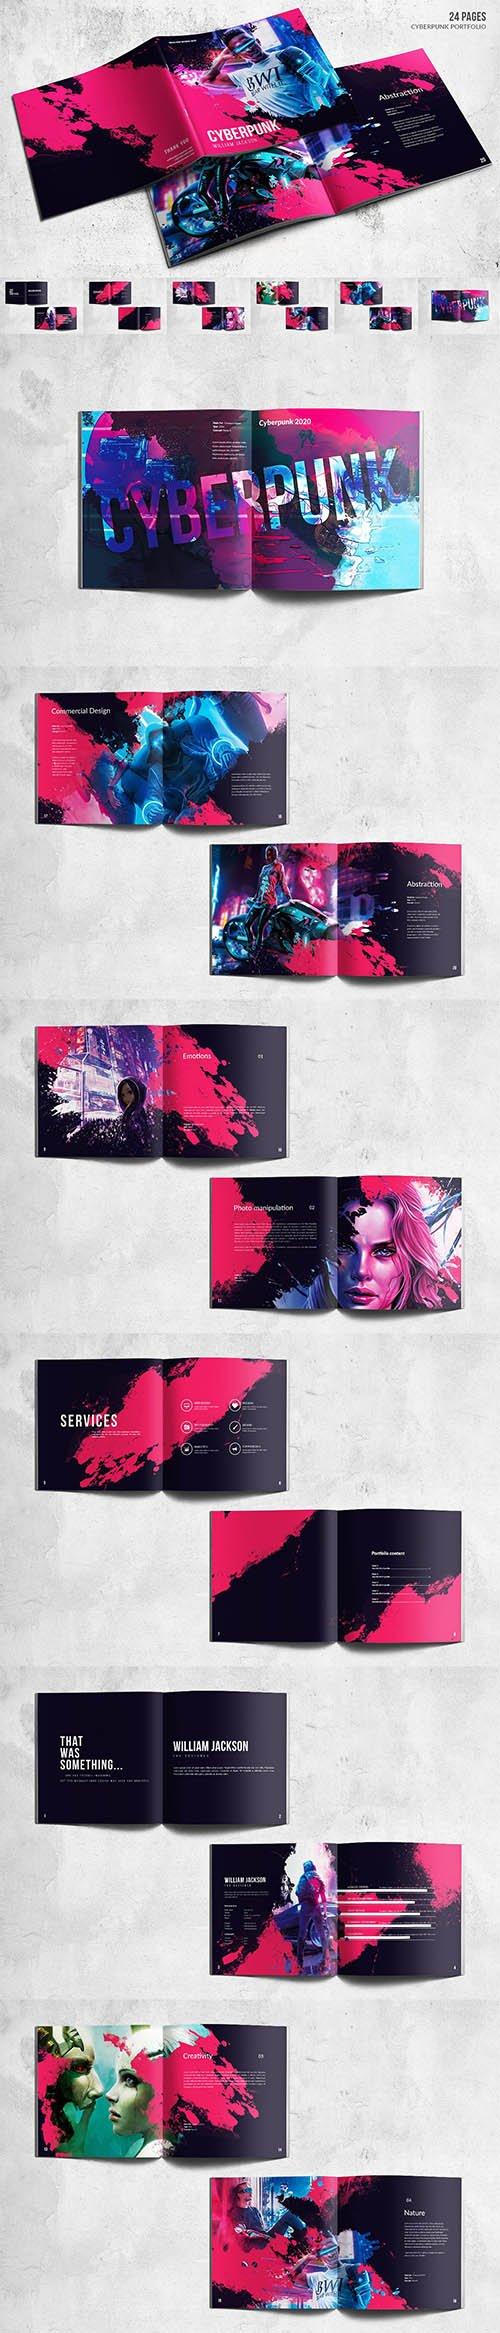 Square Cyberpunk Bifold Portfolio